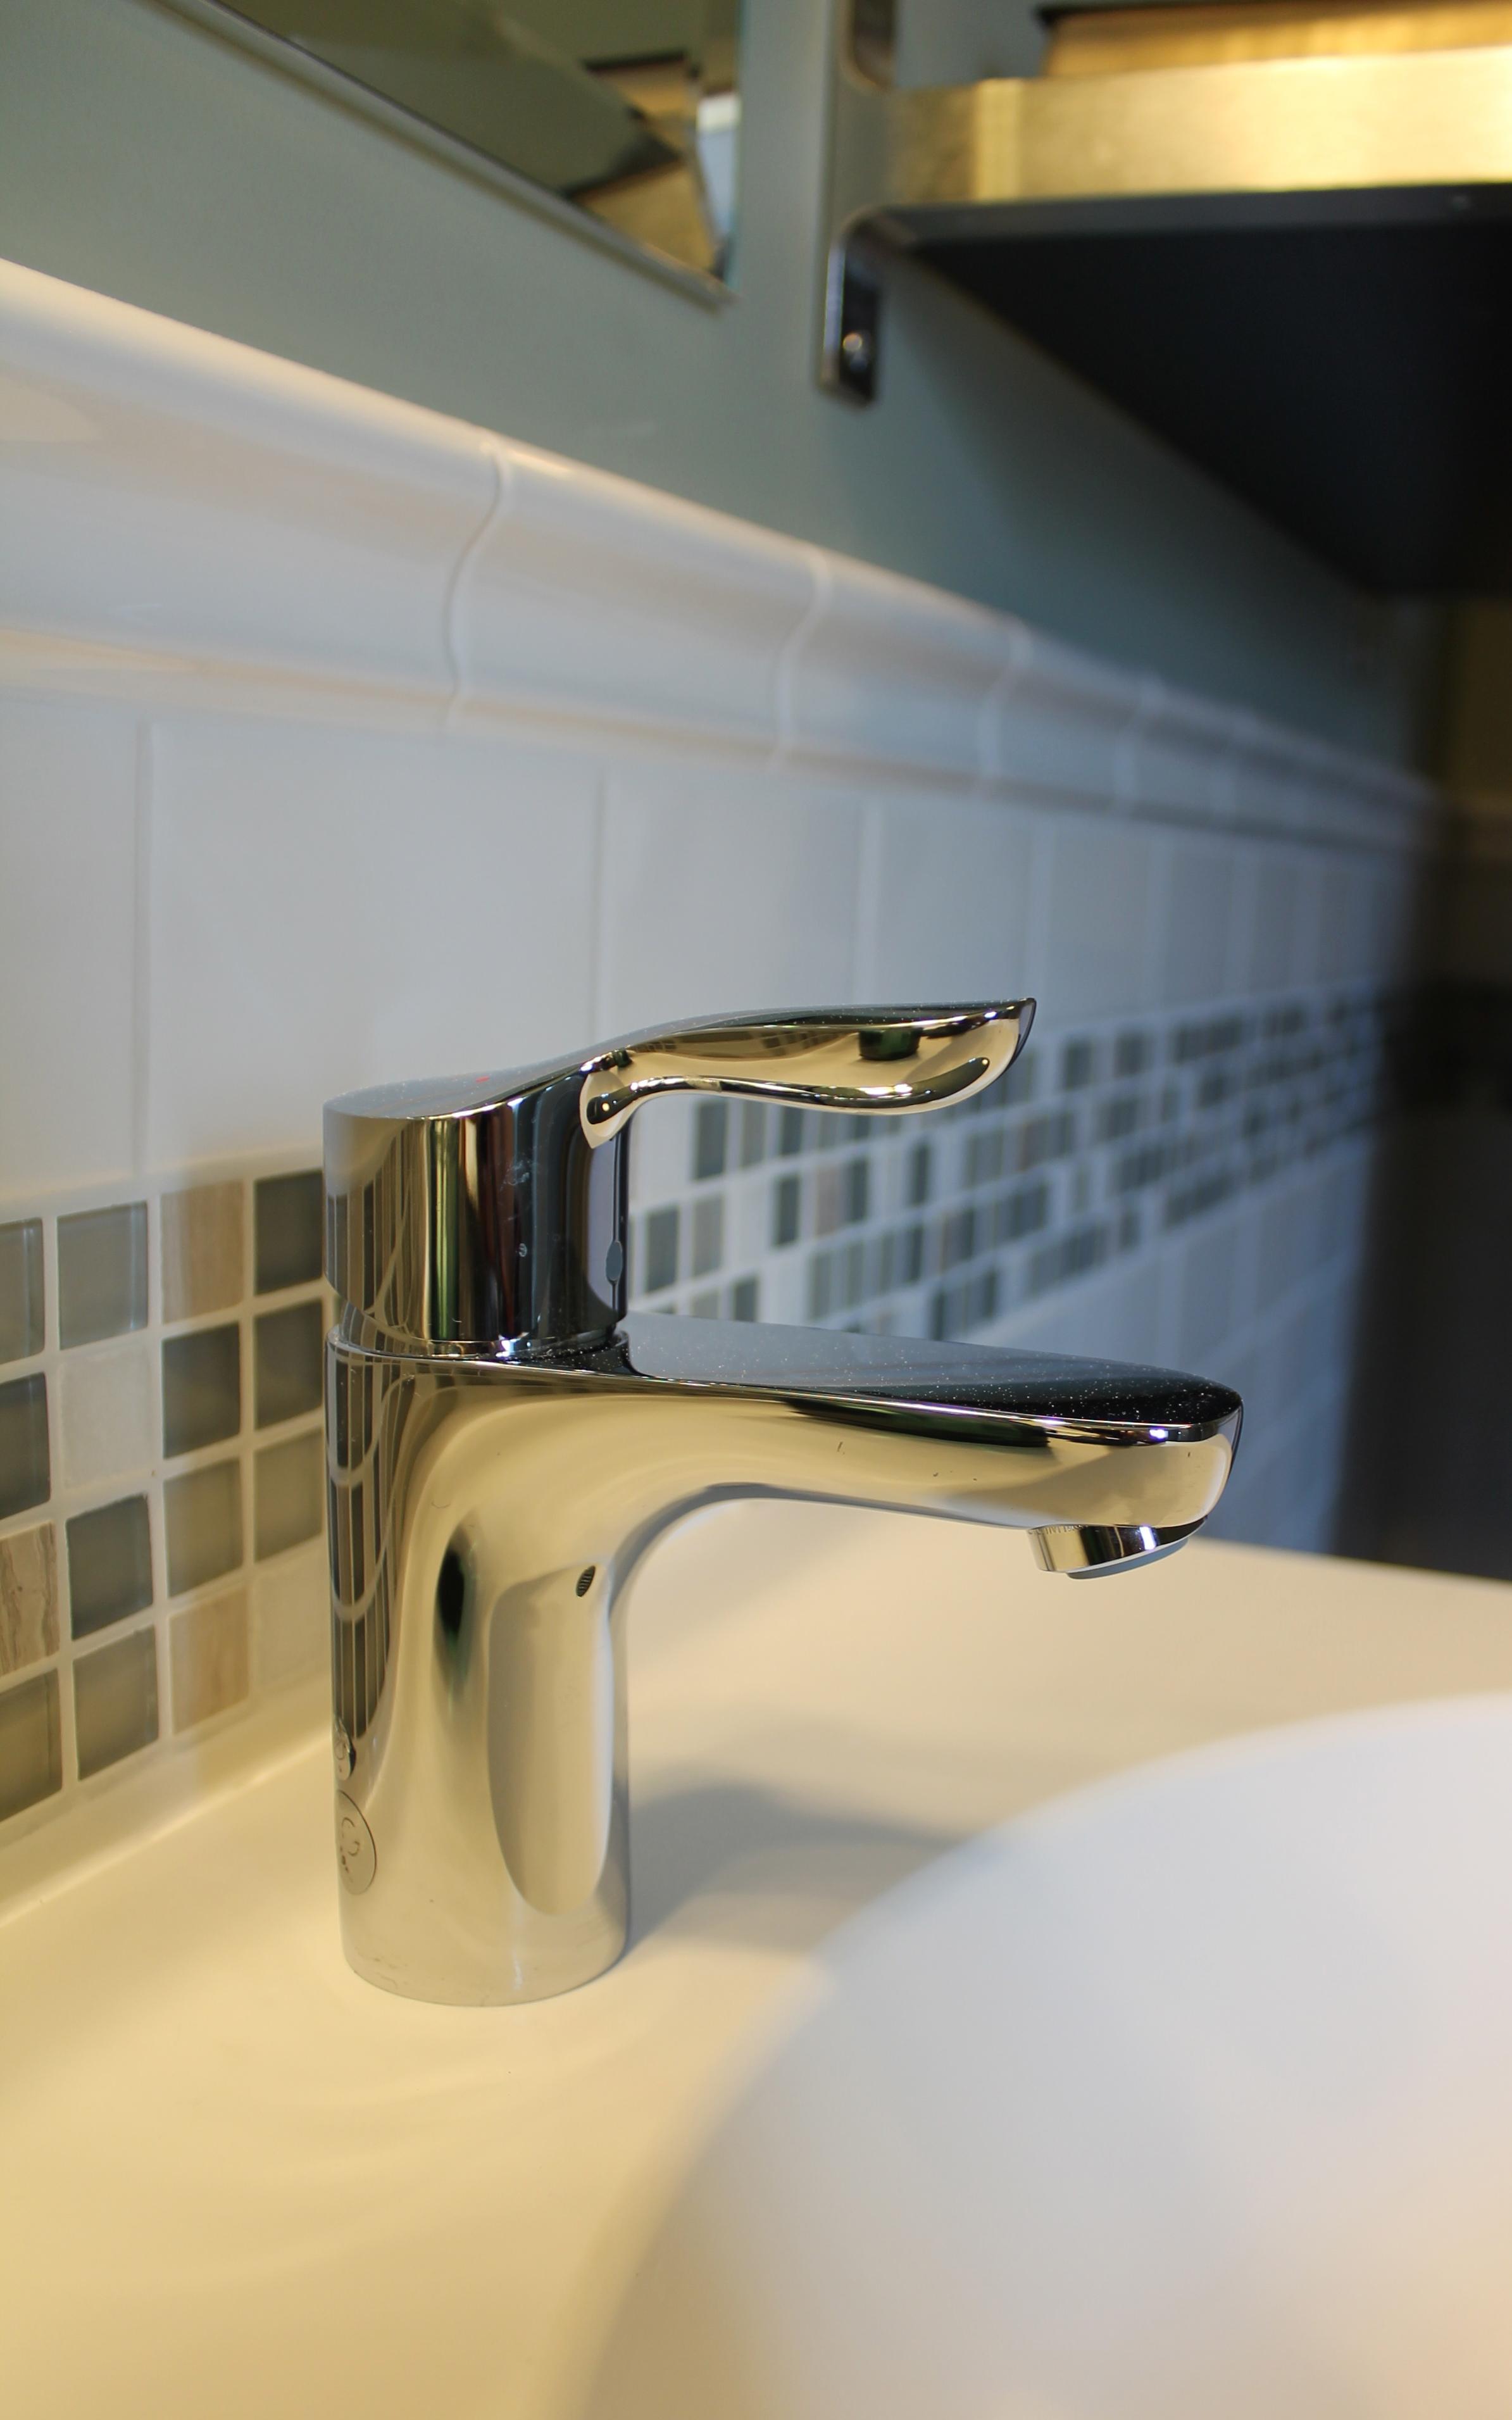 Kohler ADA water efficient faucet